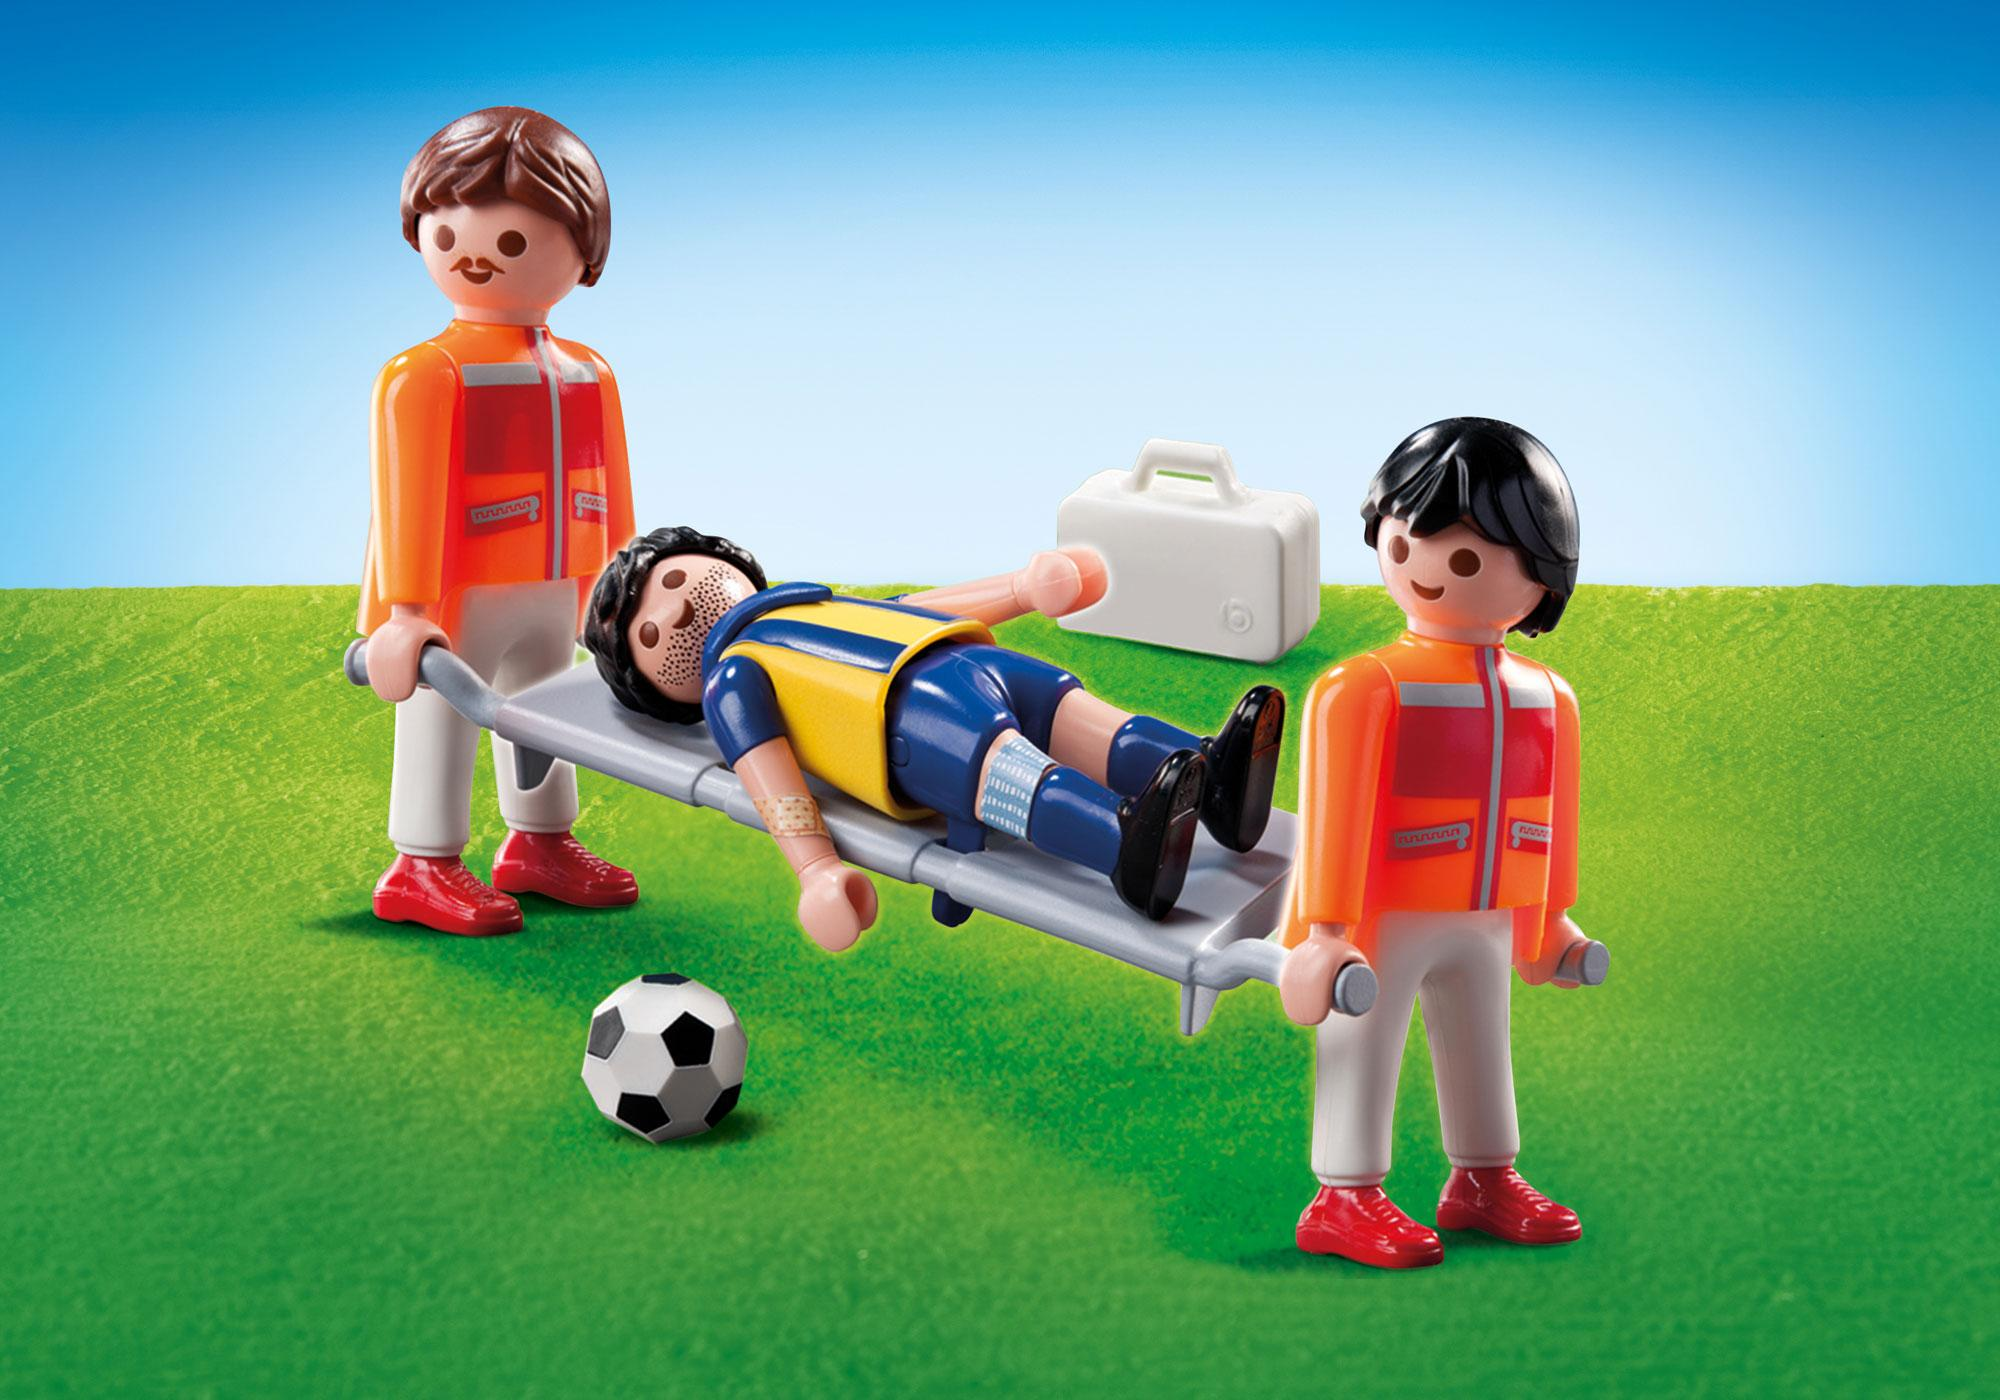 9826_product_detail/Τραυματιοφορείς με φορείο και ποδοσφαιριστή